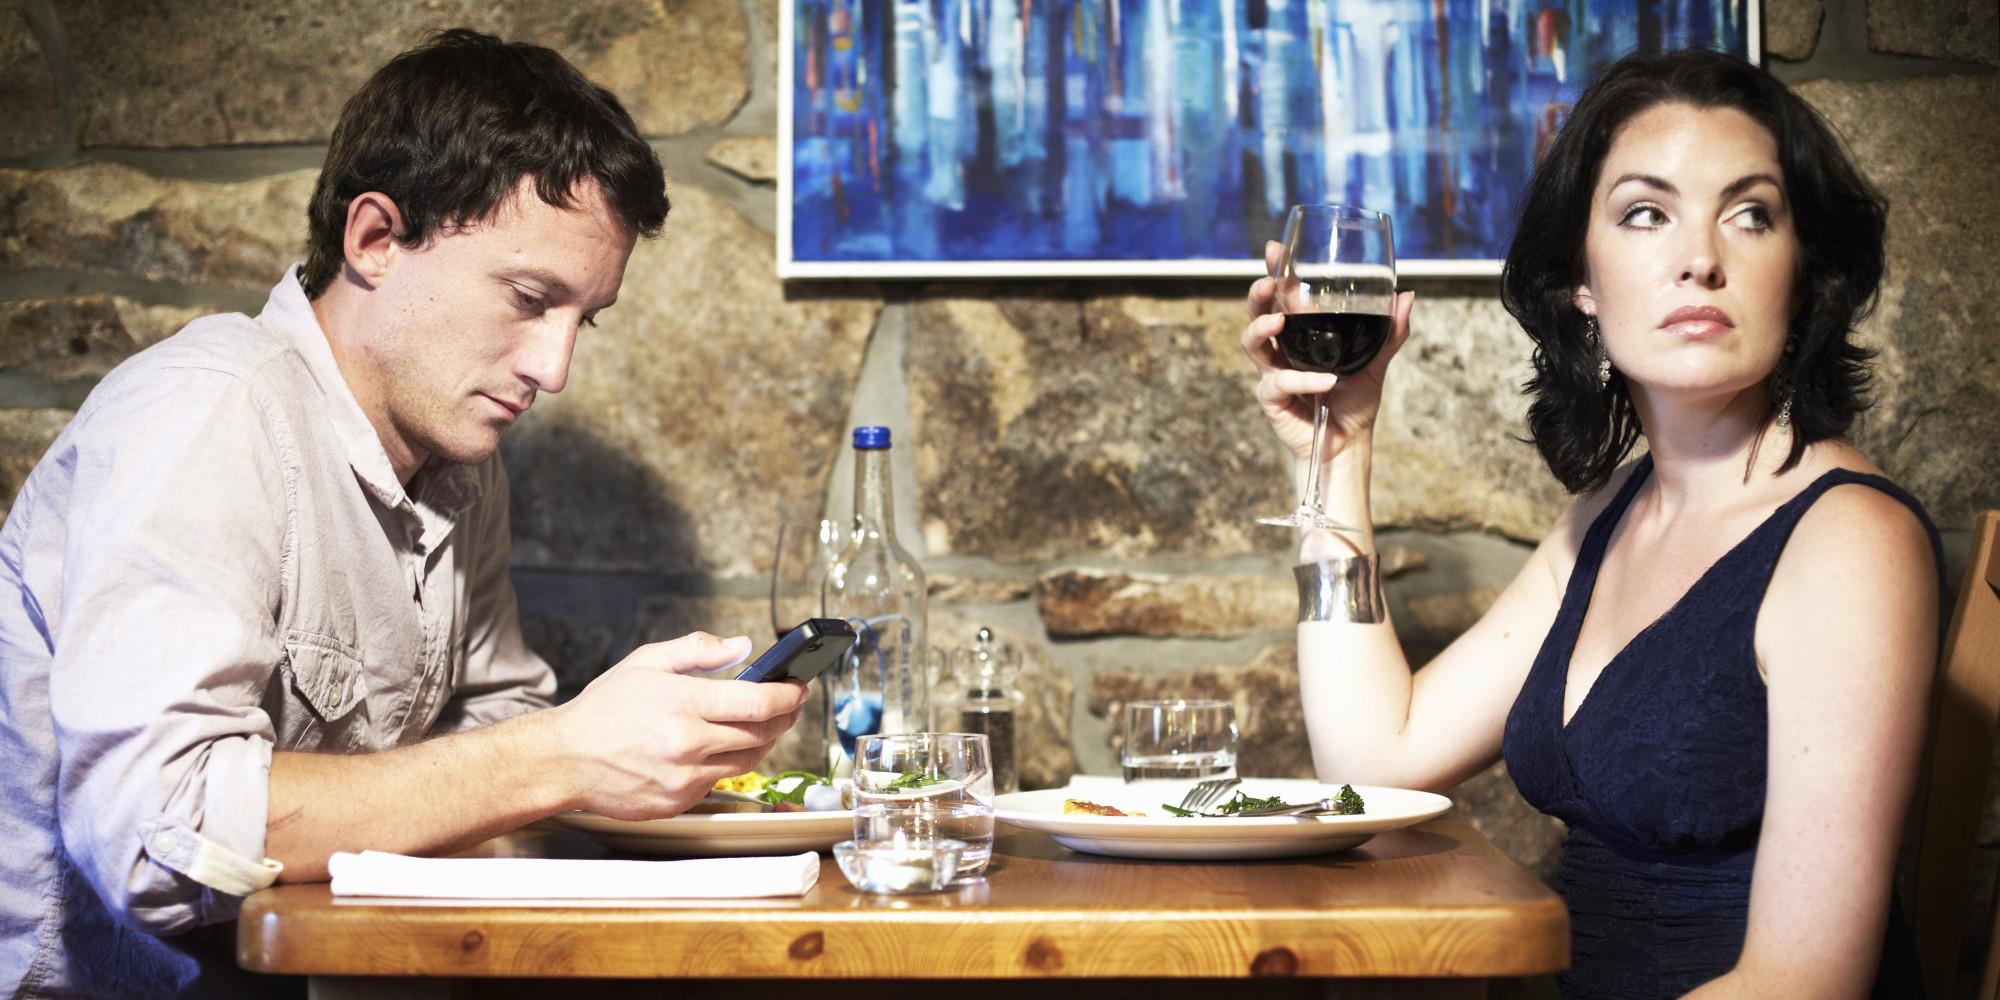 https://i1.wp.com/cdn.bgr.com/2014/07/smartphone-restaurant1.jpg